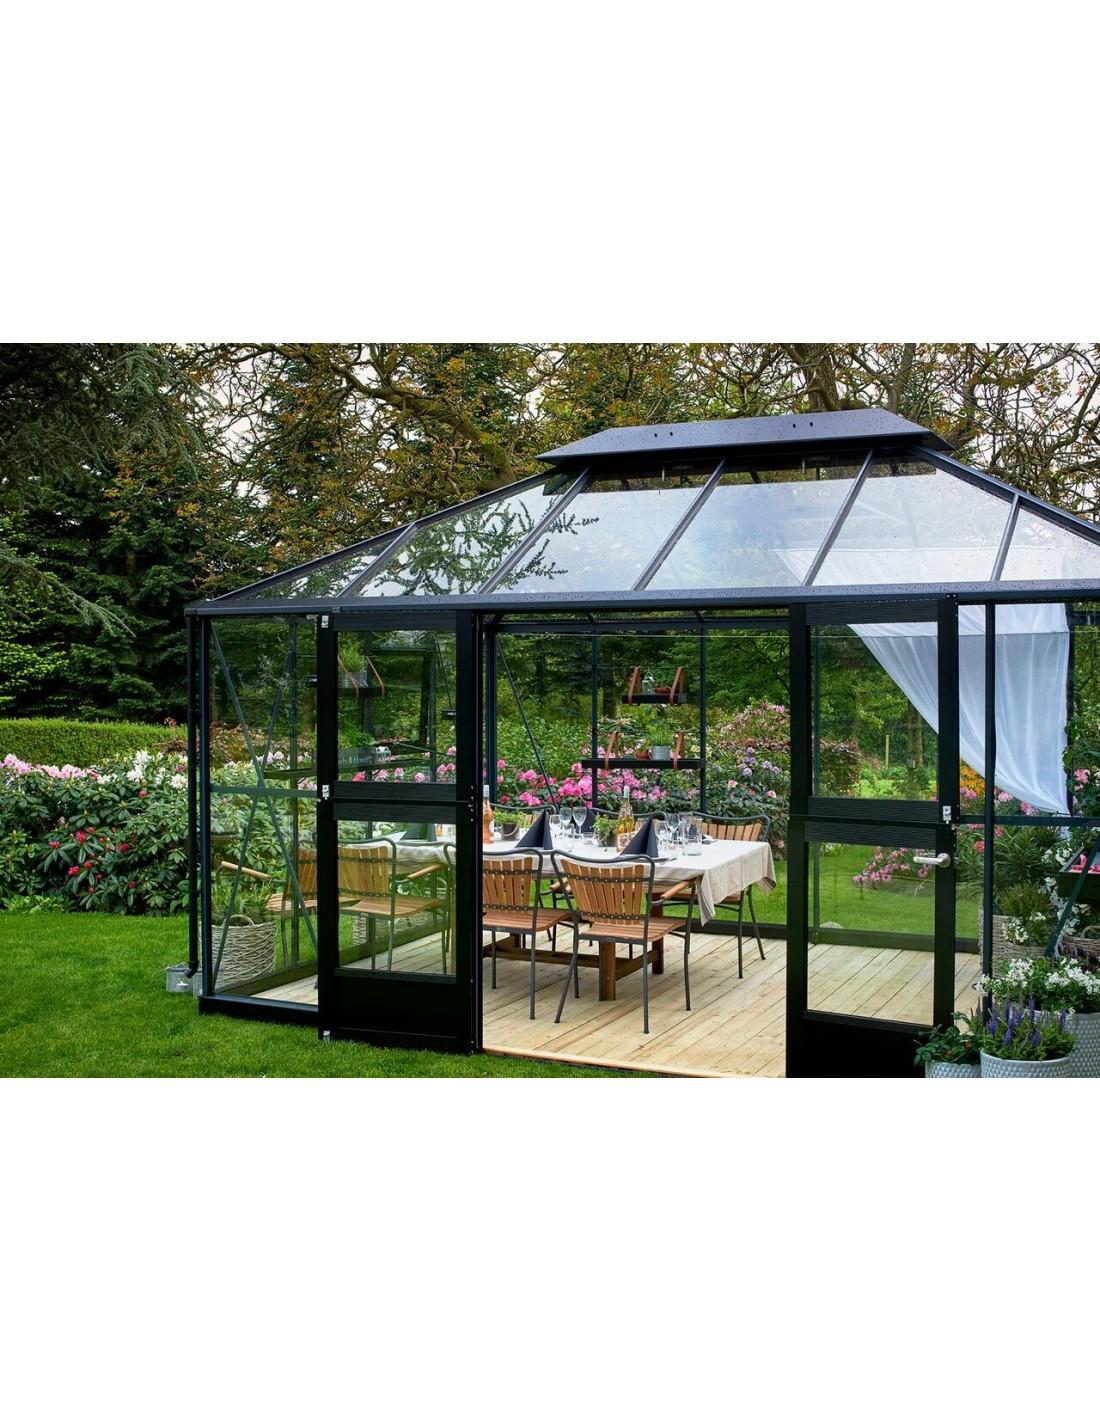 serre oase juliana verre tremp naturel ou anthracite de 13 m. Black Bedroom Furniture Sets. Home Design Ideas